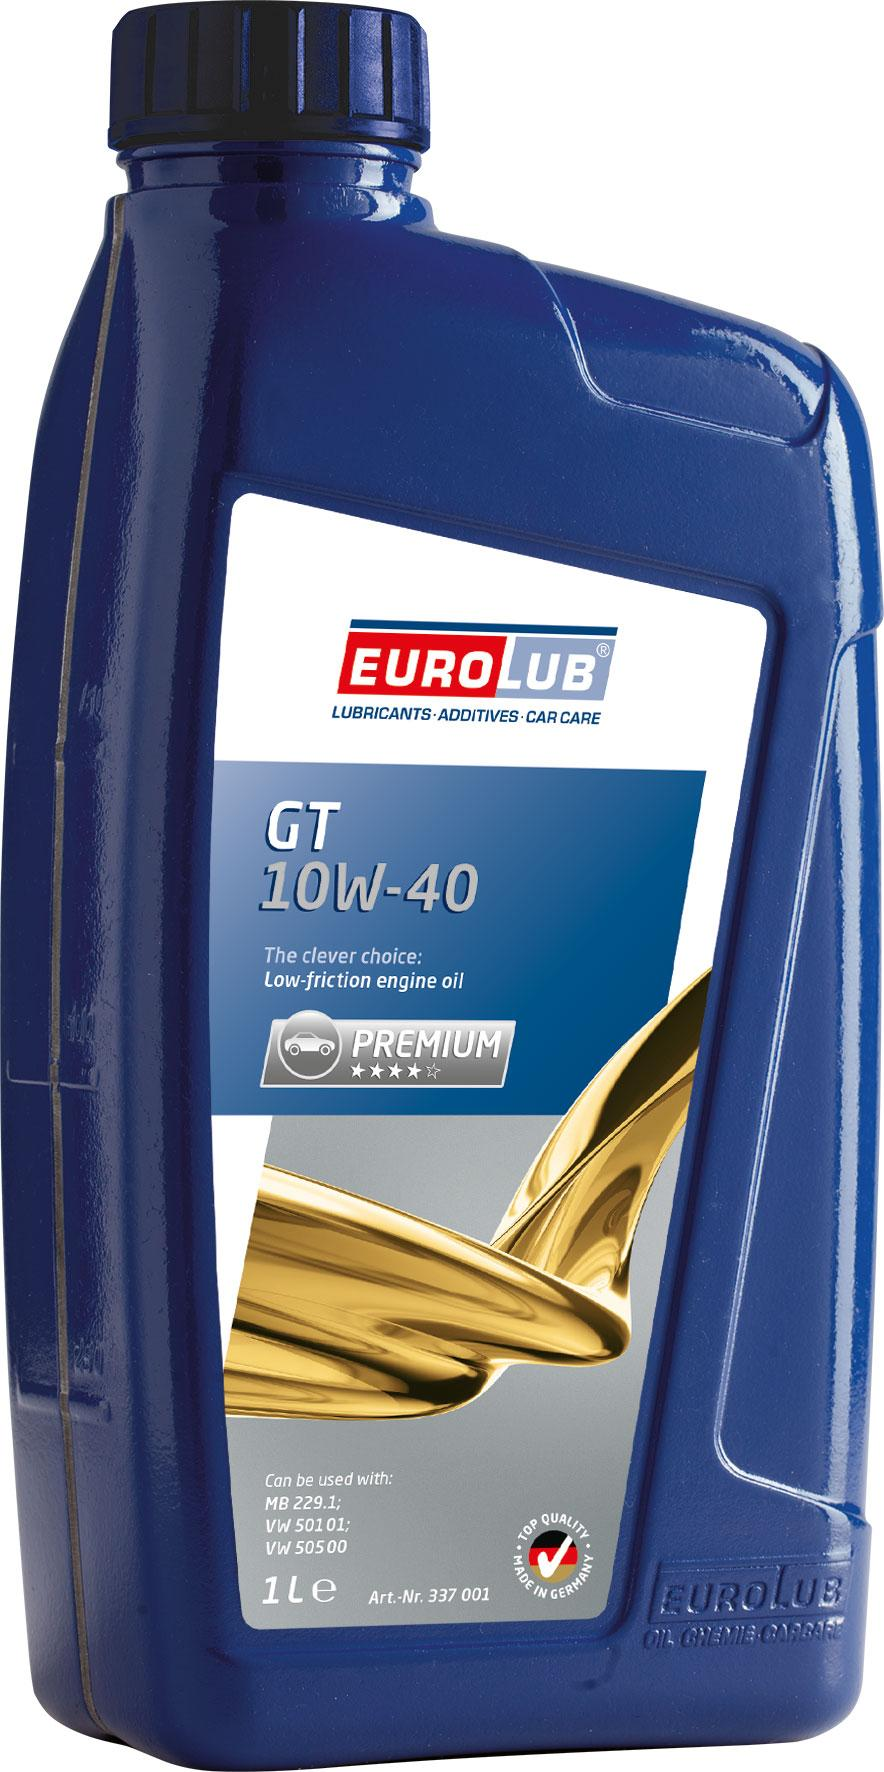 337001 EUROLUB GT 10W-40, 1l Motoröl 337001 günstig kaufen